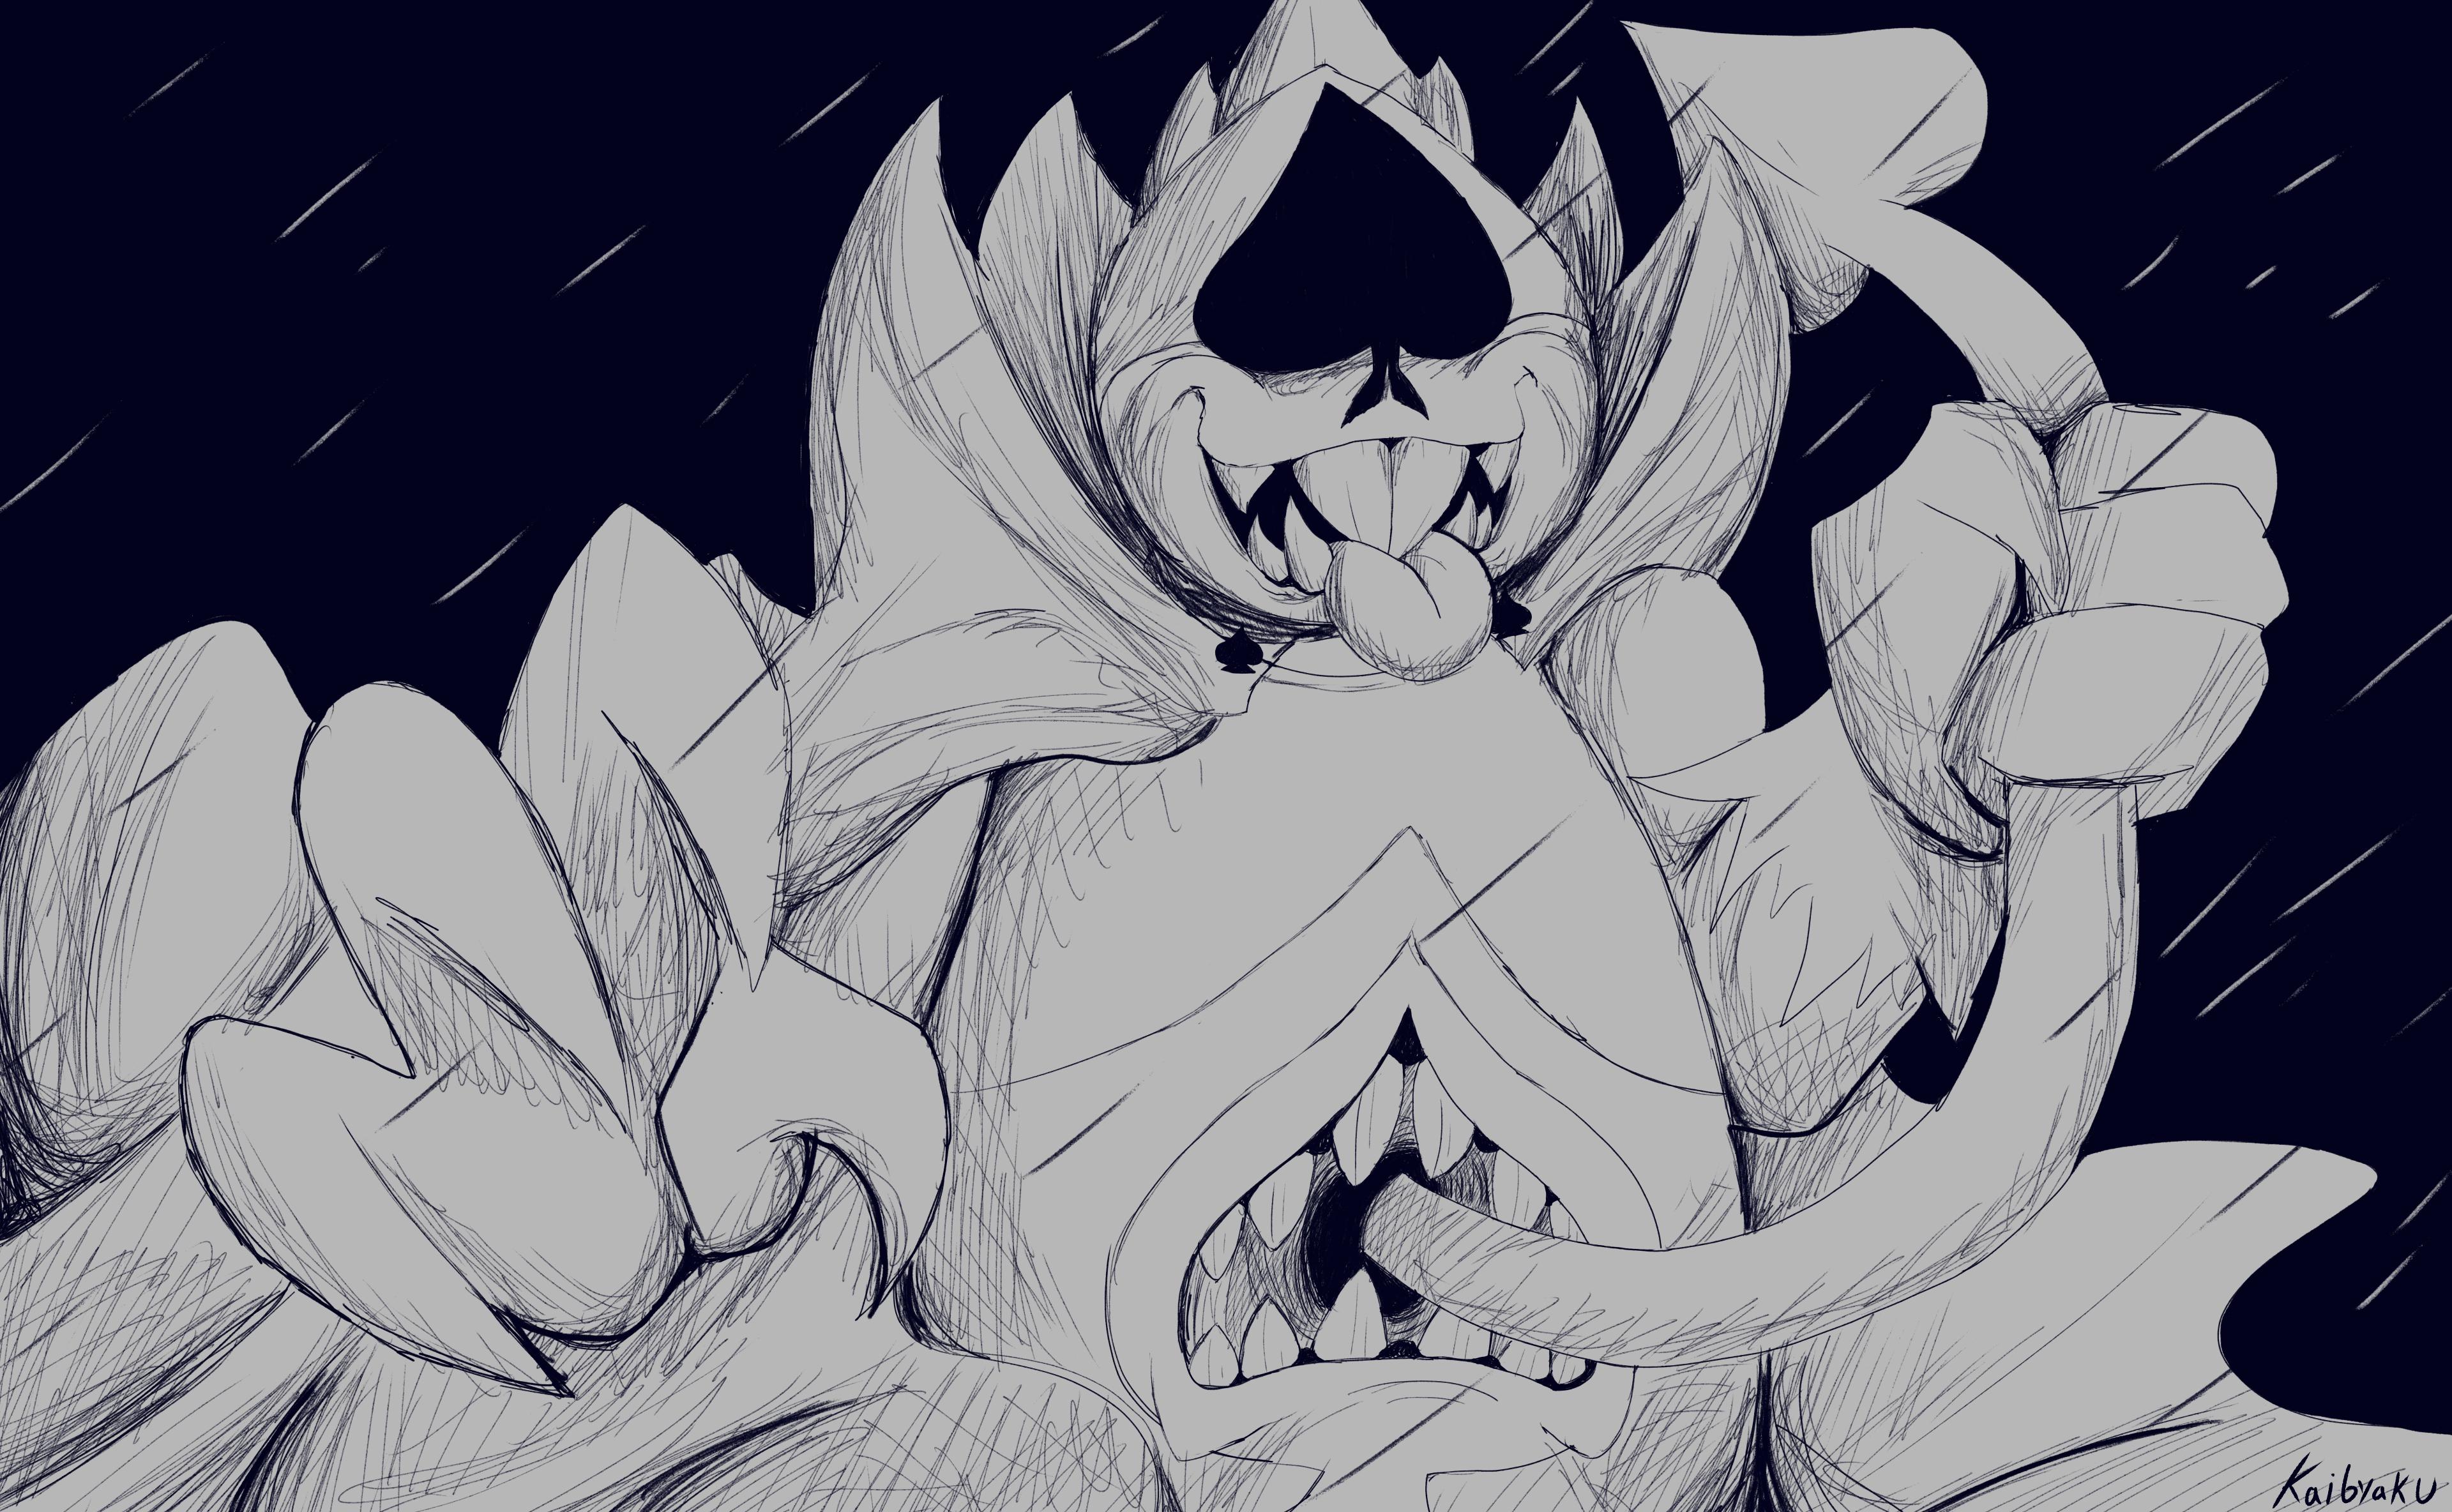 Chaos King (Deltarune)